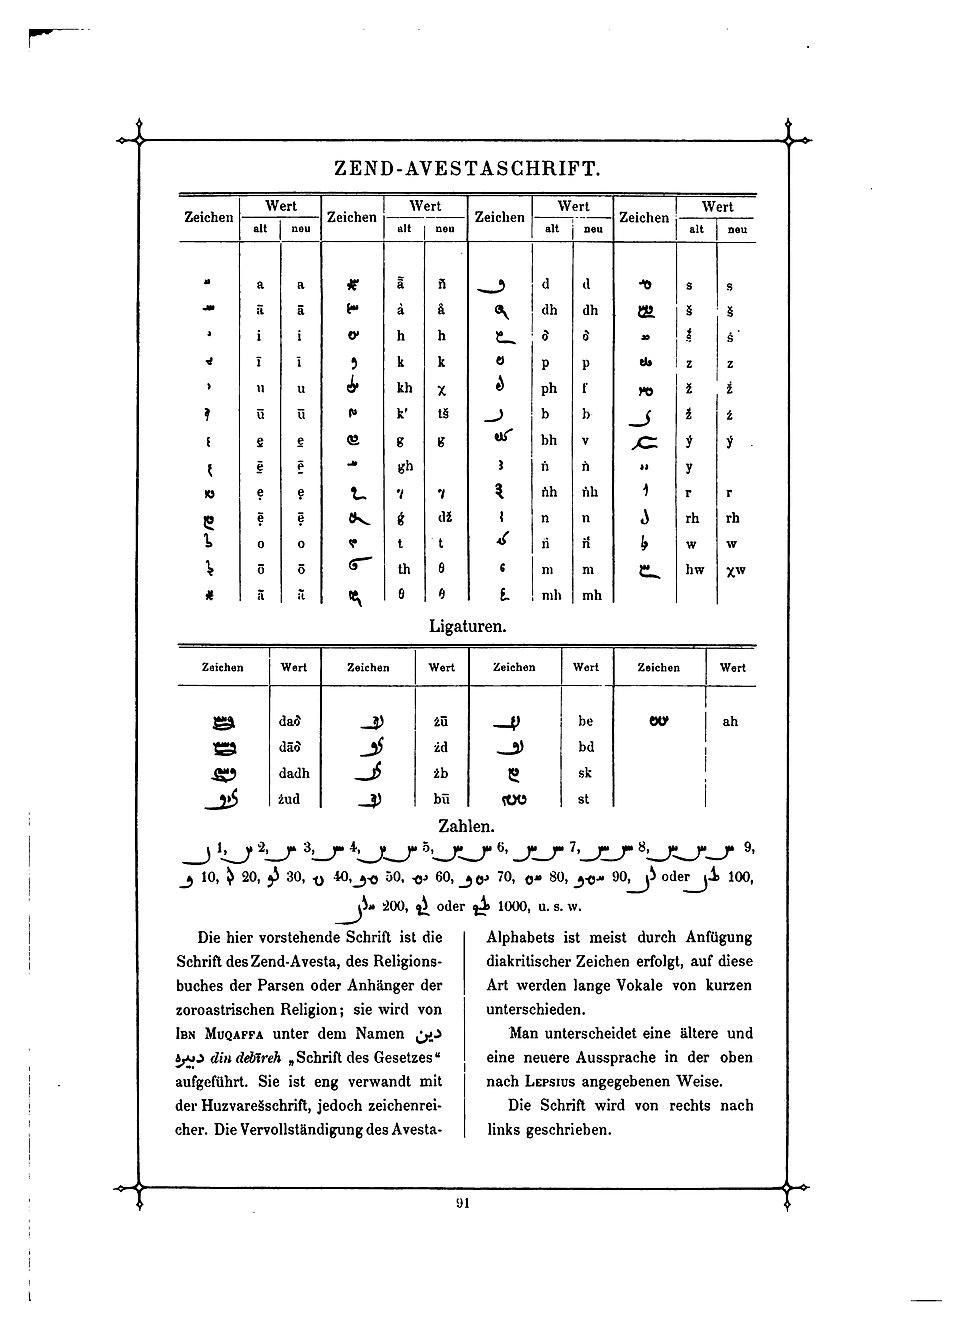 Das Buch der Schrift (Faulmann) 106